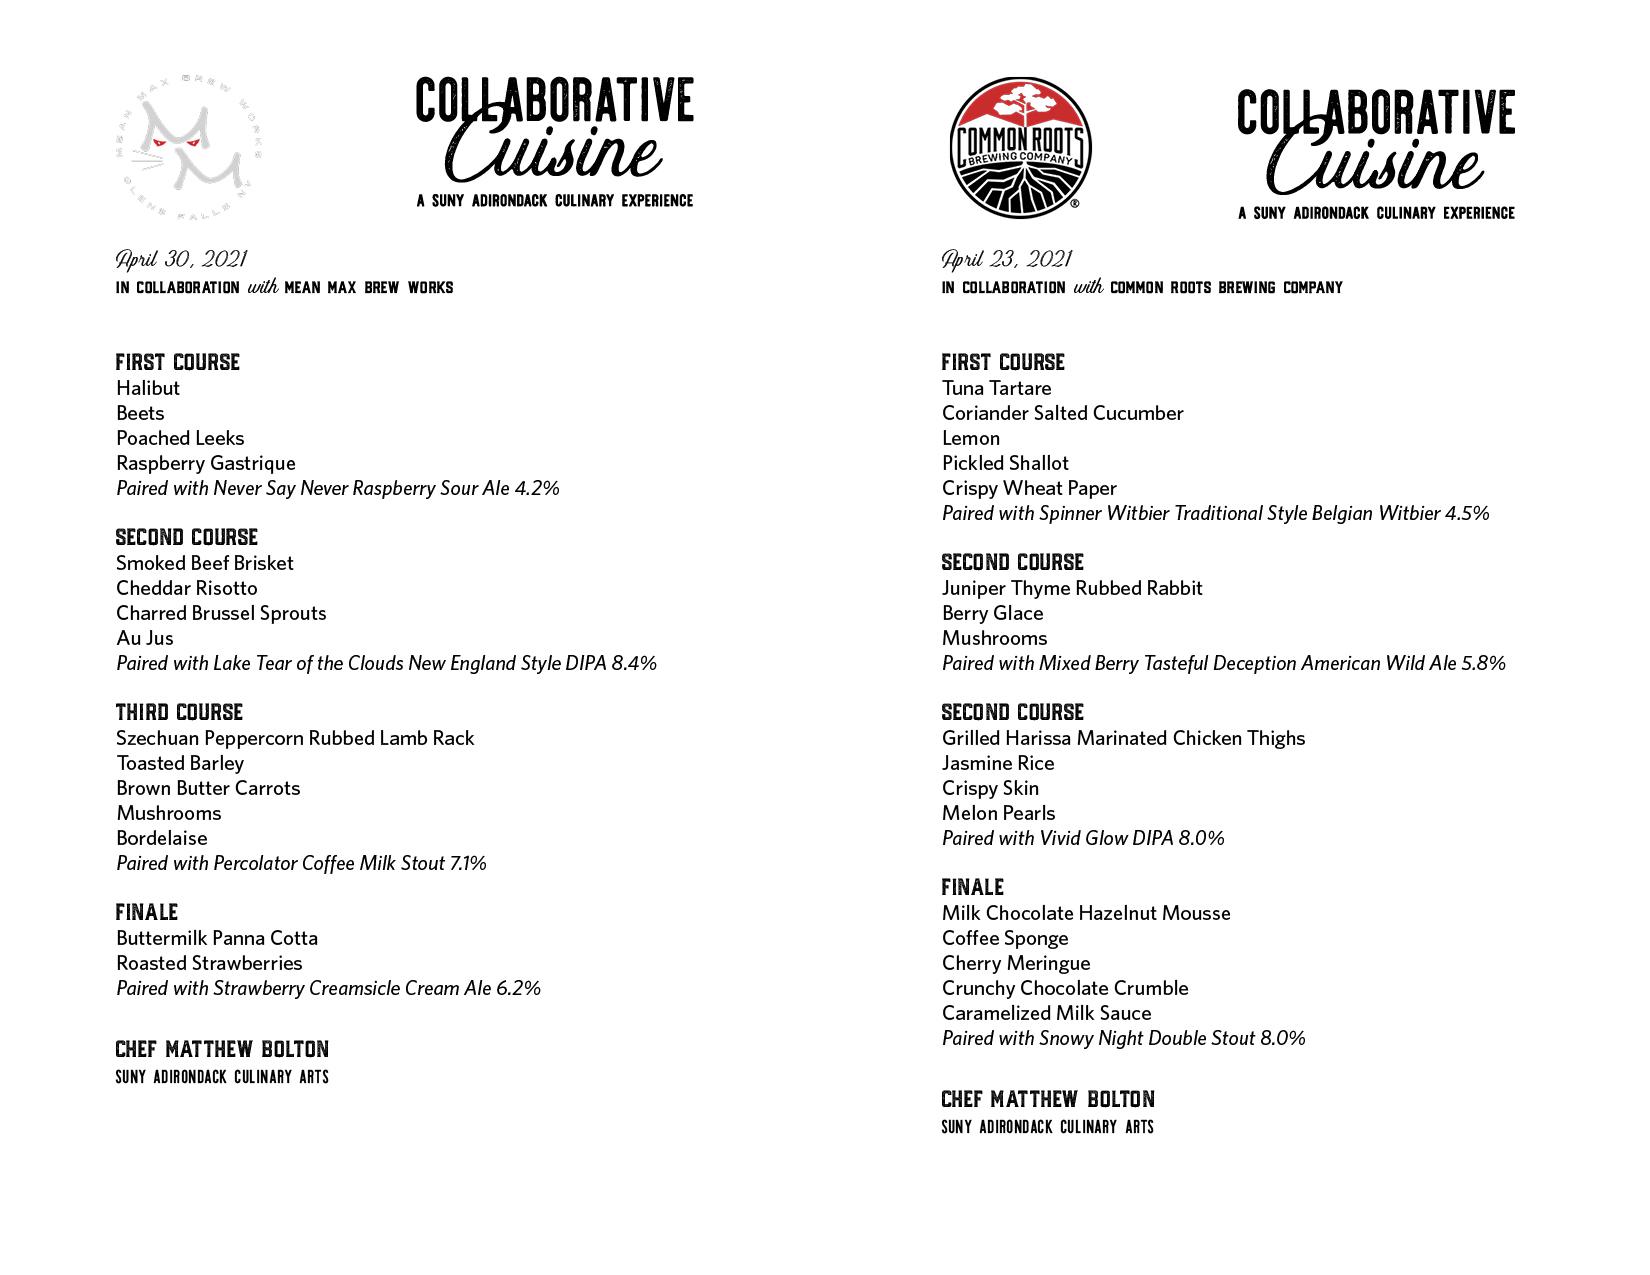 Collaborative Cuisine Menu from April 27 & April 30